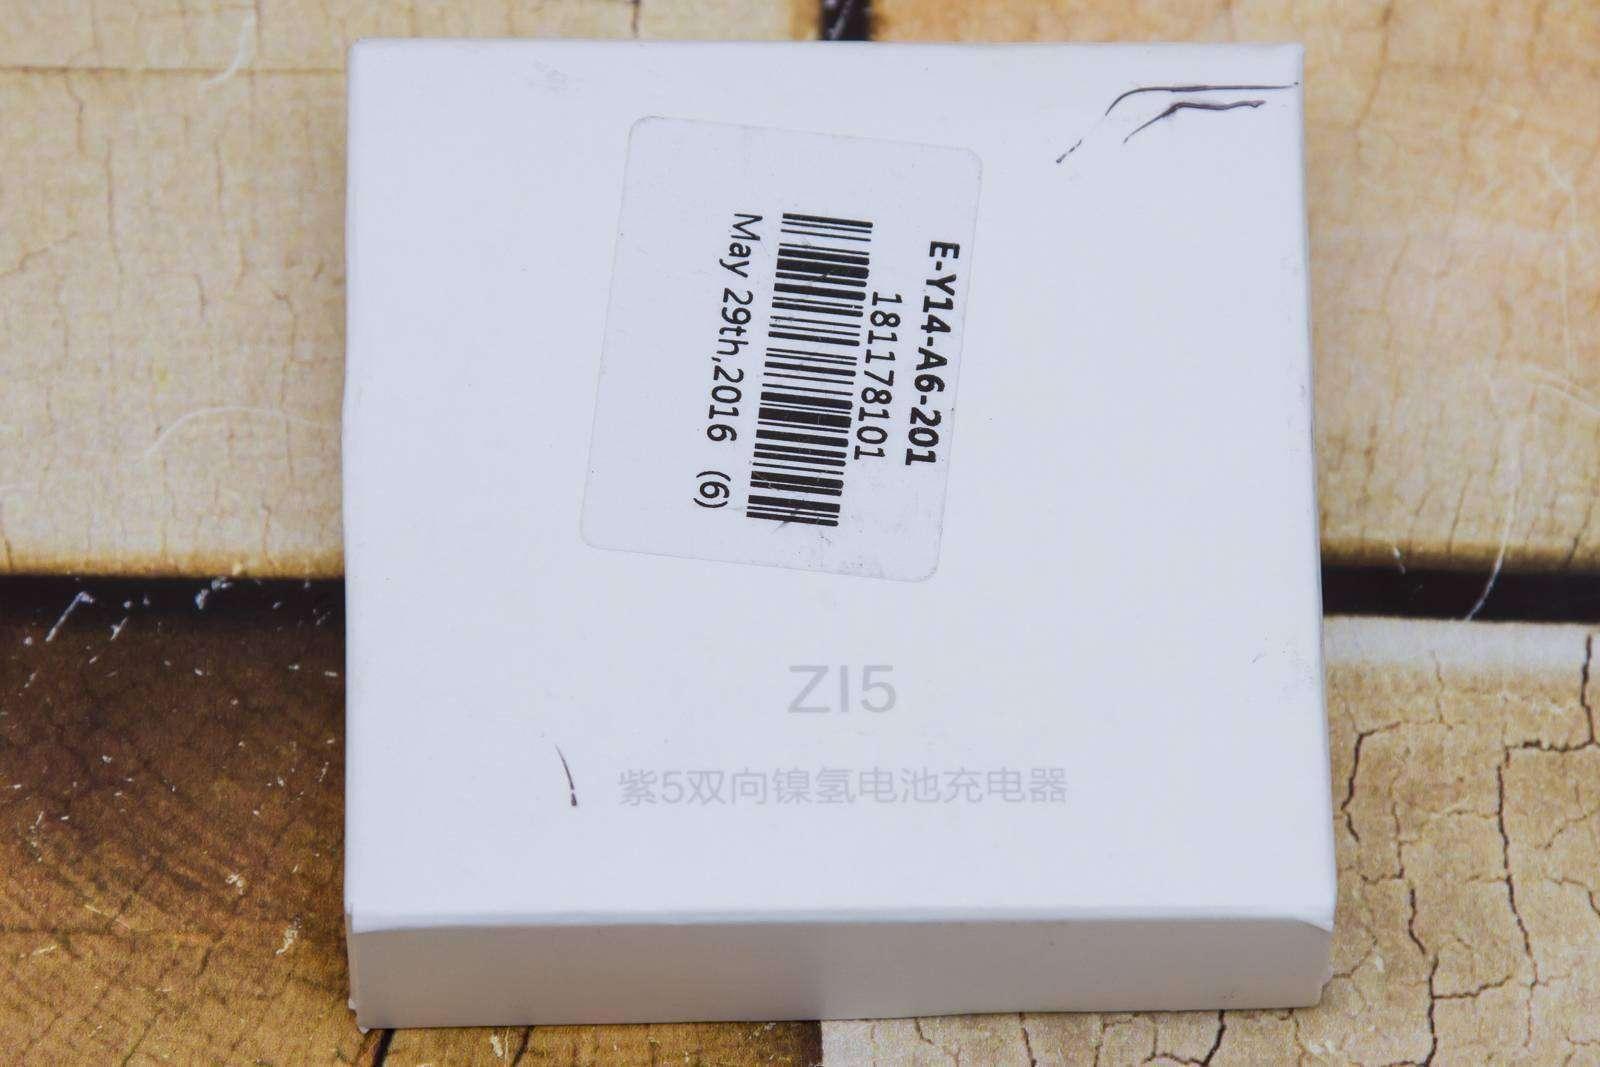 GearBest: Недорогие домашние зарядки, часть 7 - Xiaomi ZI5 AA AAA